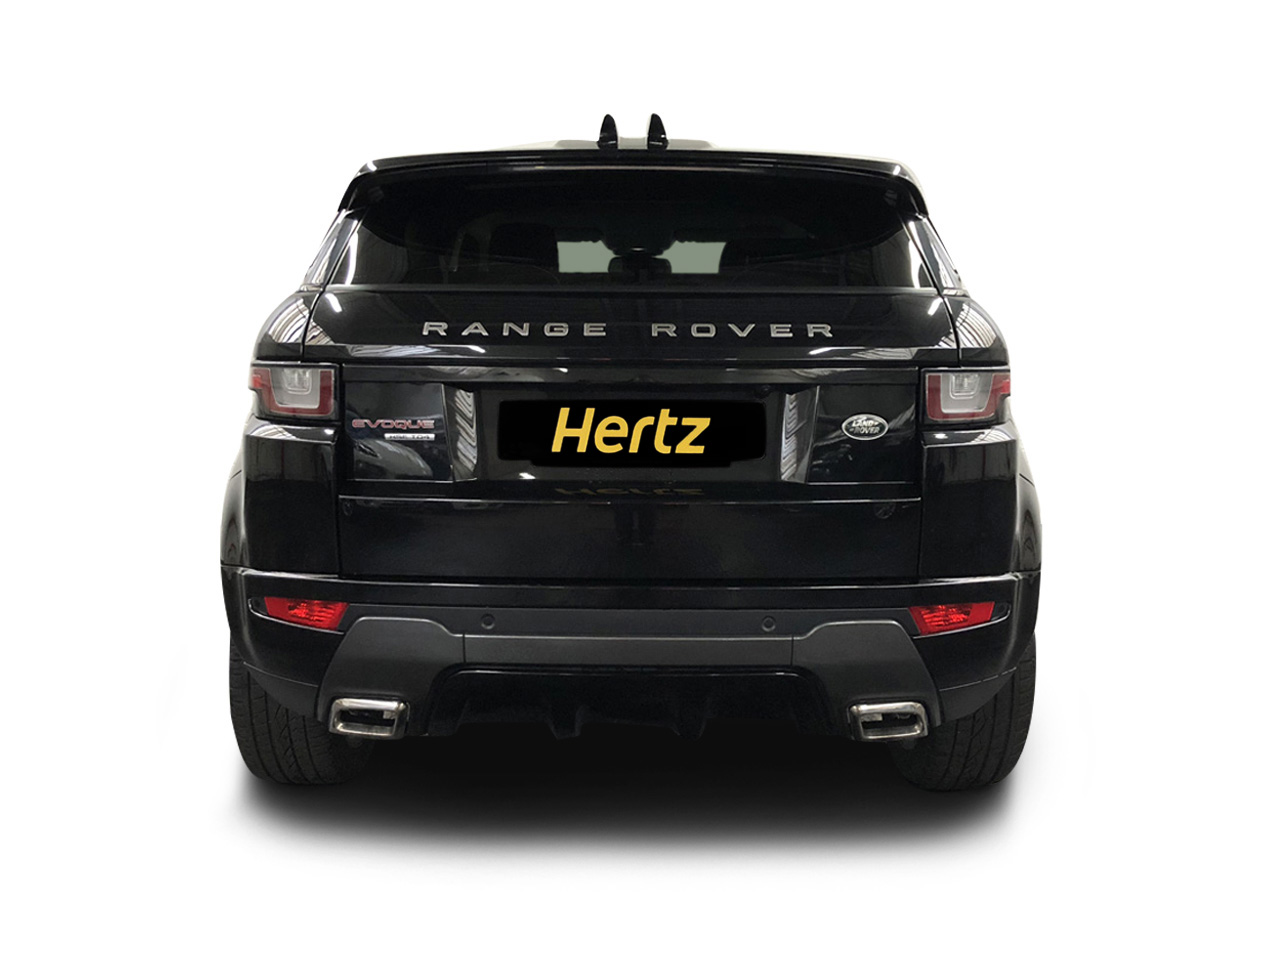 Range Rover Evoque Car for hire